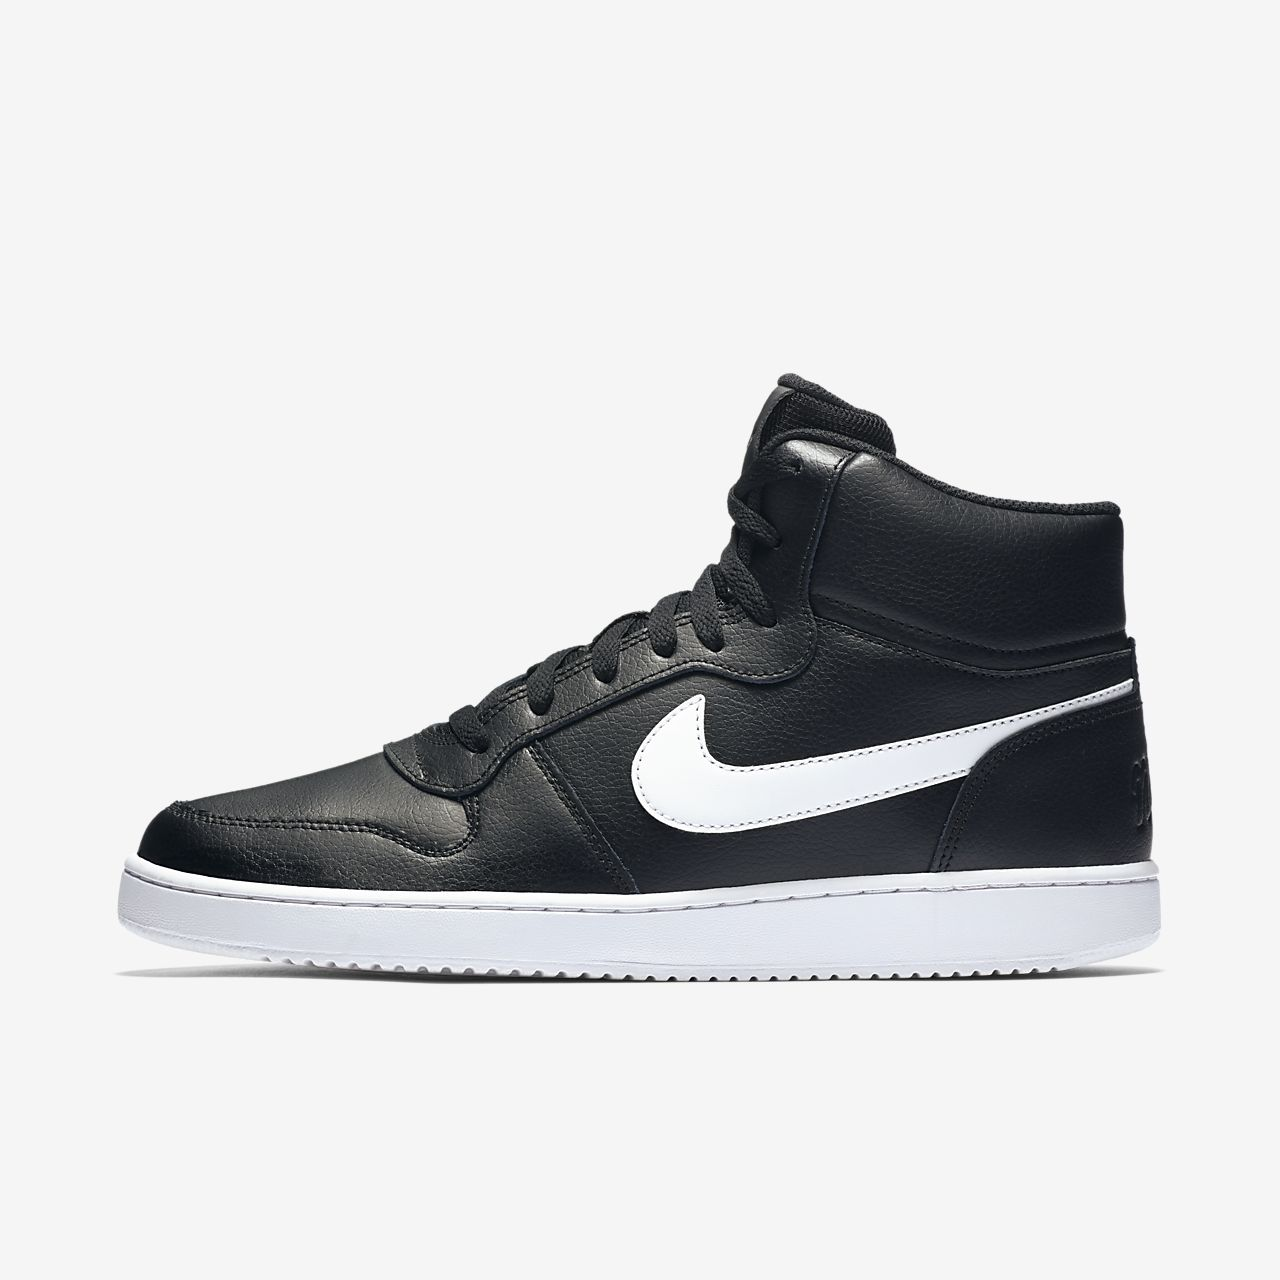 Nike Ebernon Mid Zwarte Sneakers | TORFS.BE | Gratis verzend